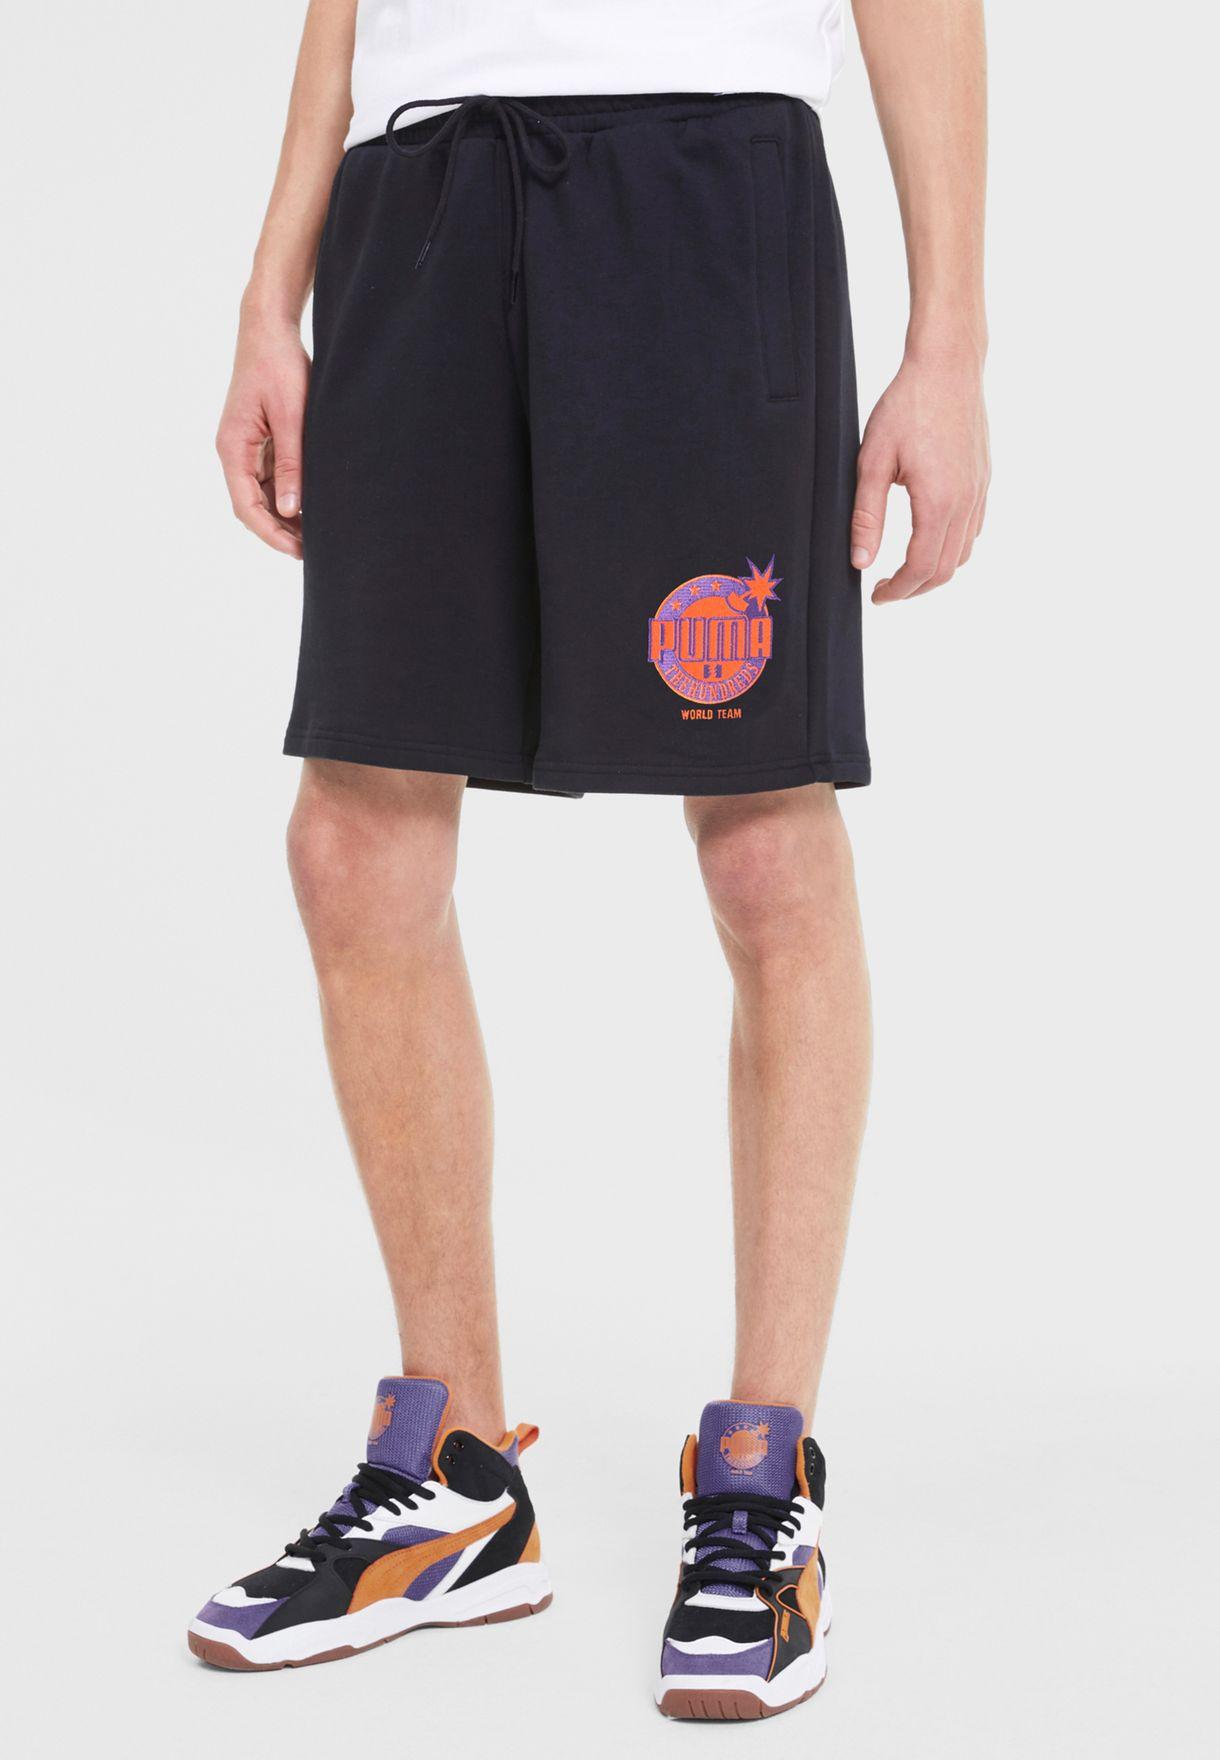 The Hundreds Shorts